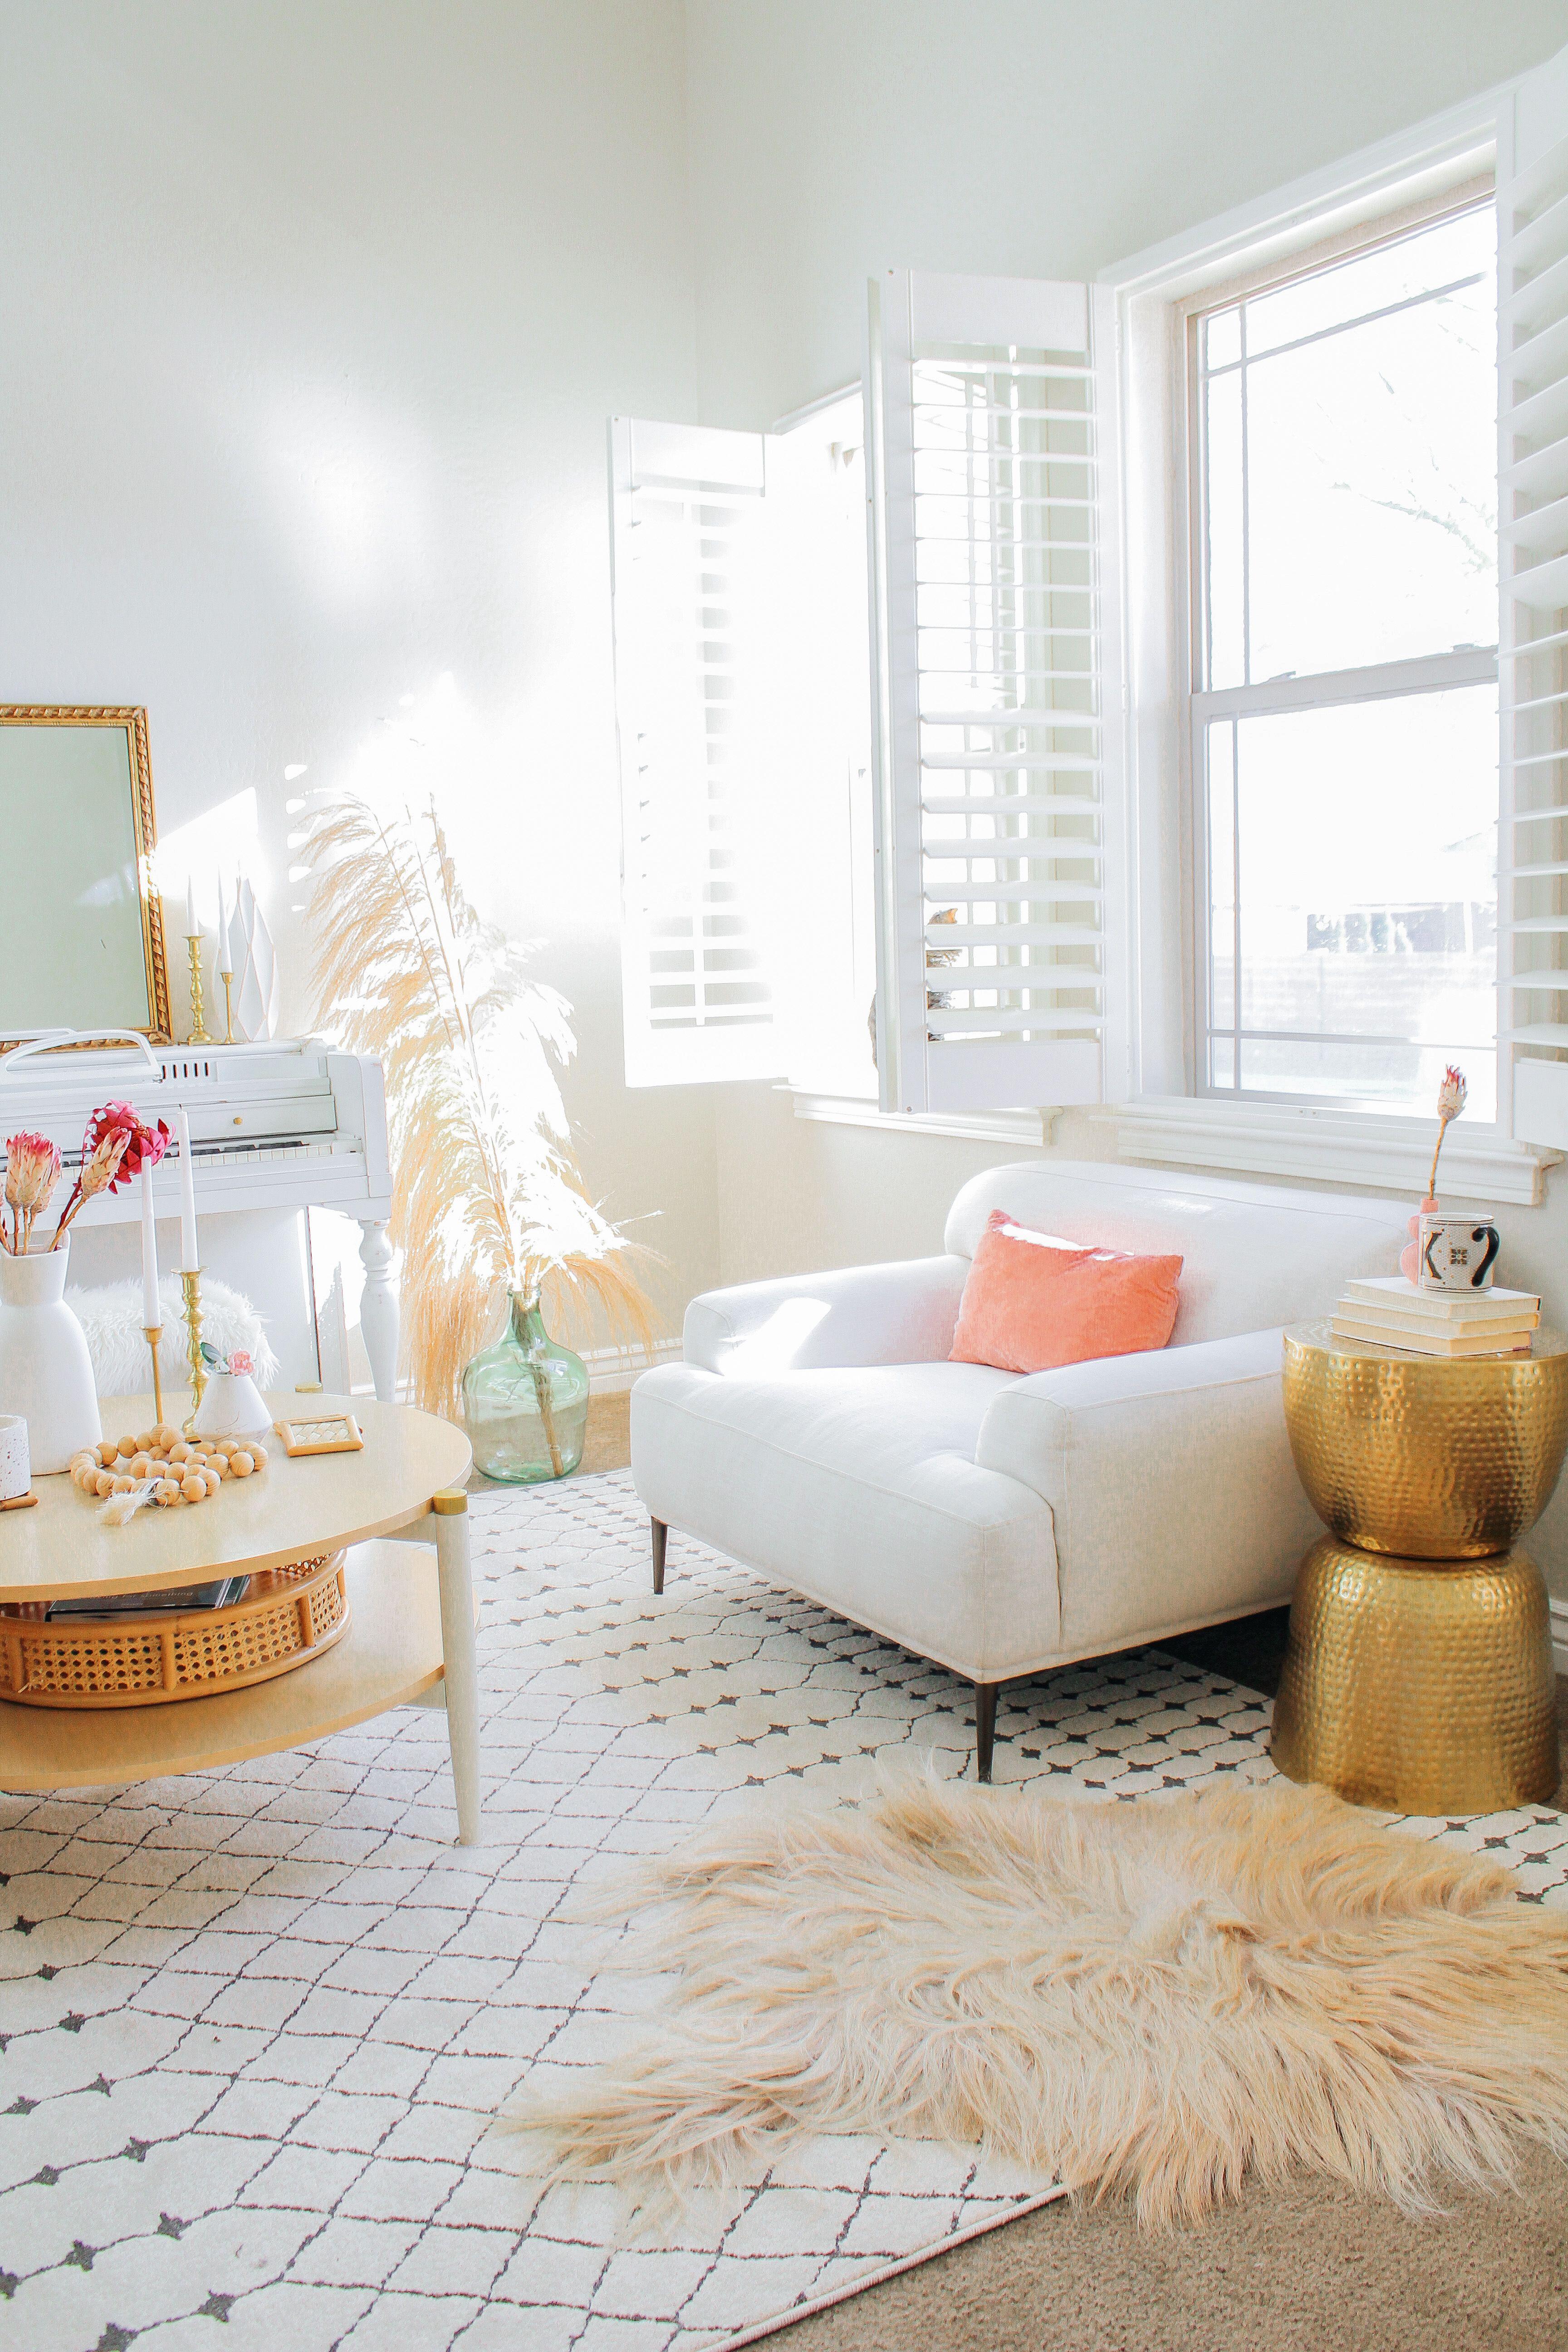 Design My Living Room Online: Abisko Quartz White Lounge Chair In 2020